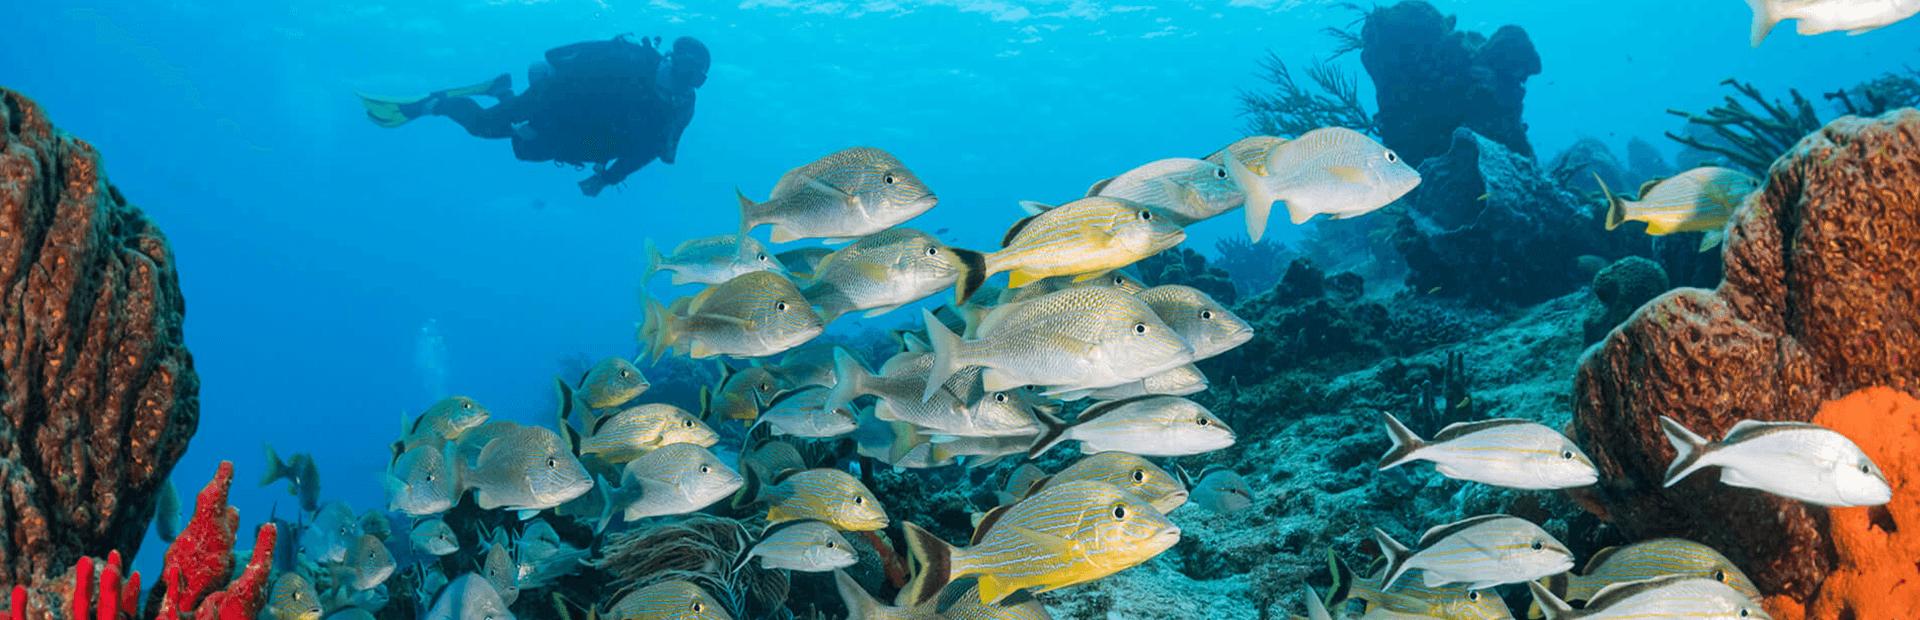 9 Tips for Drift Diving in Cozumel | Caradonna Adventures